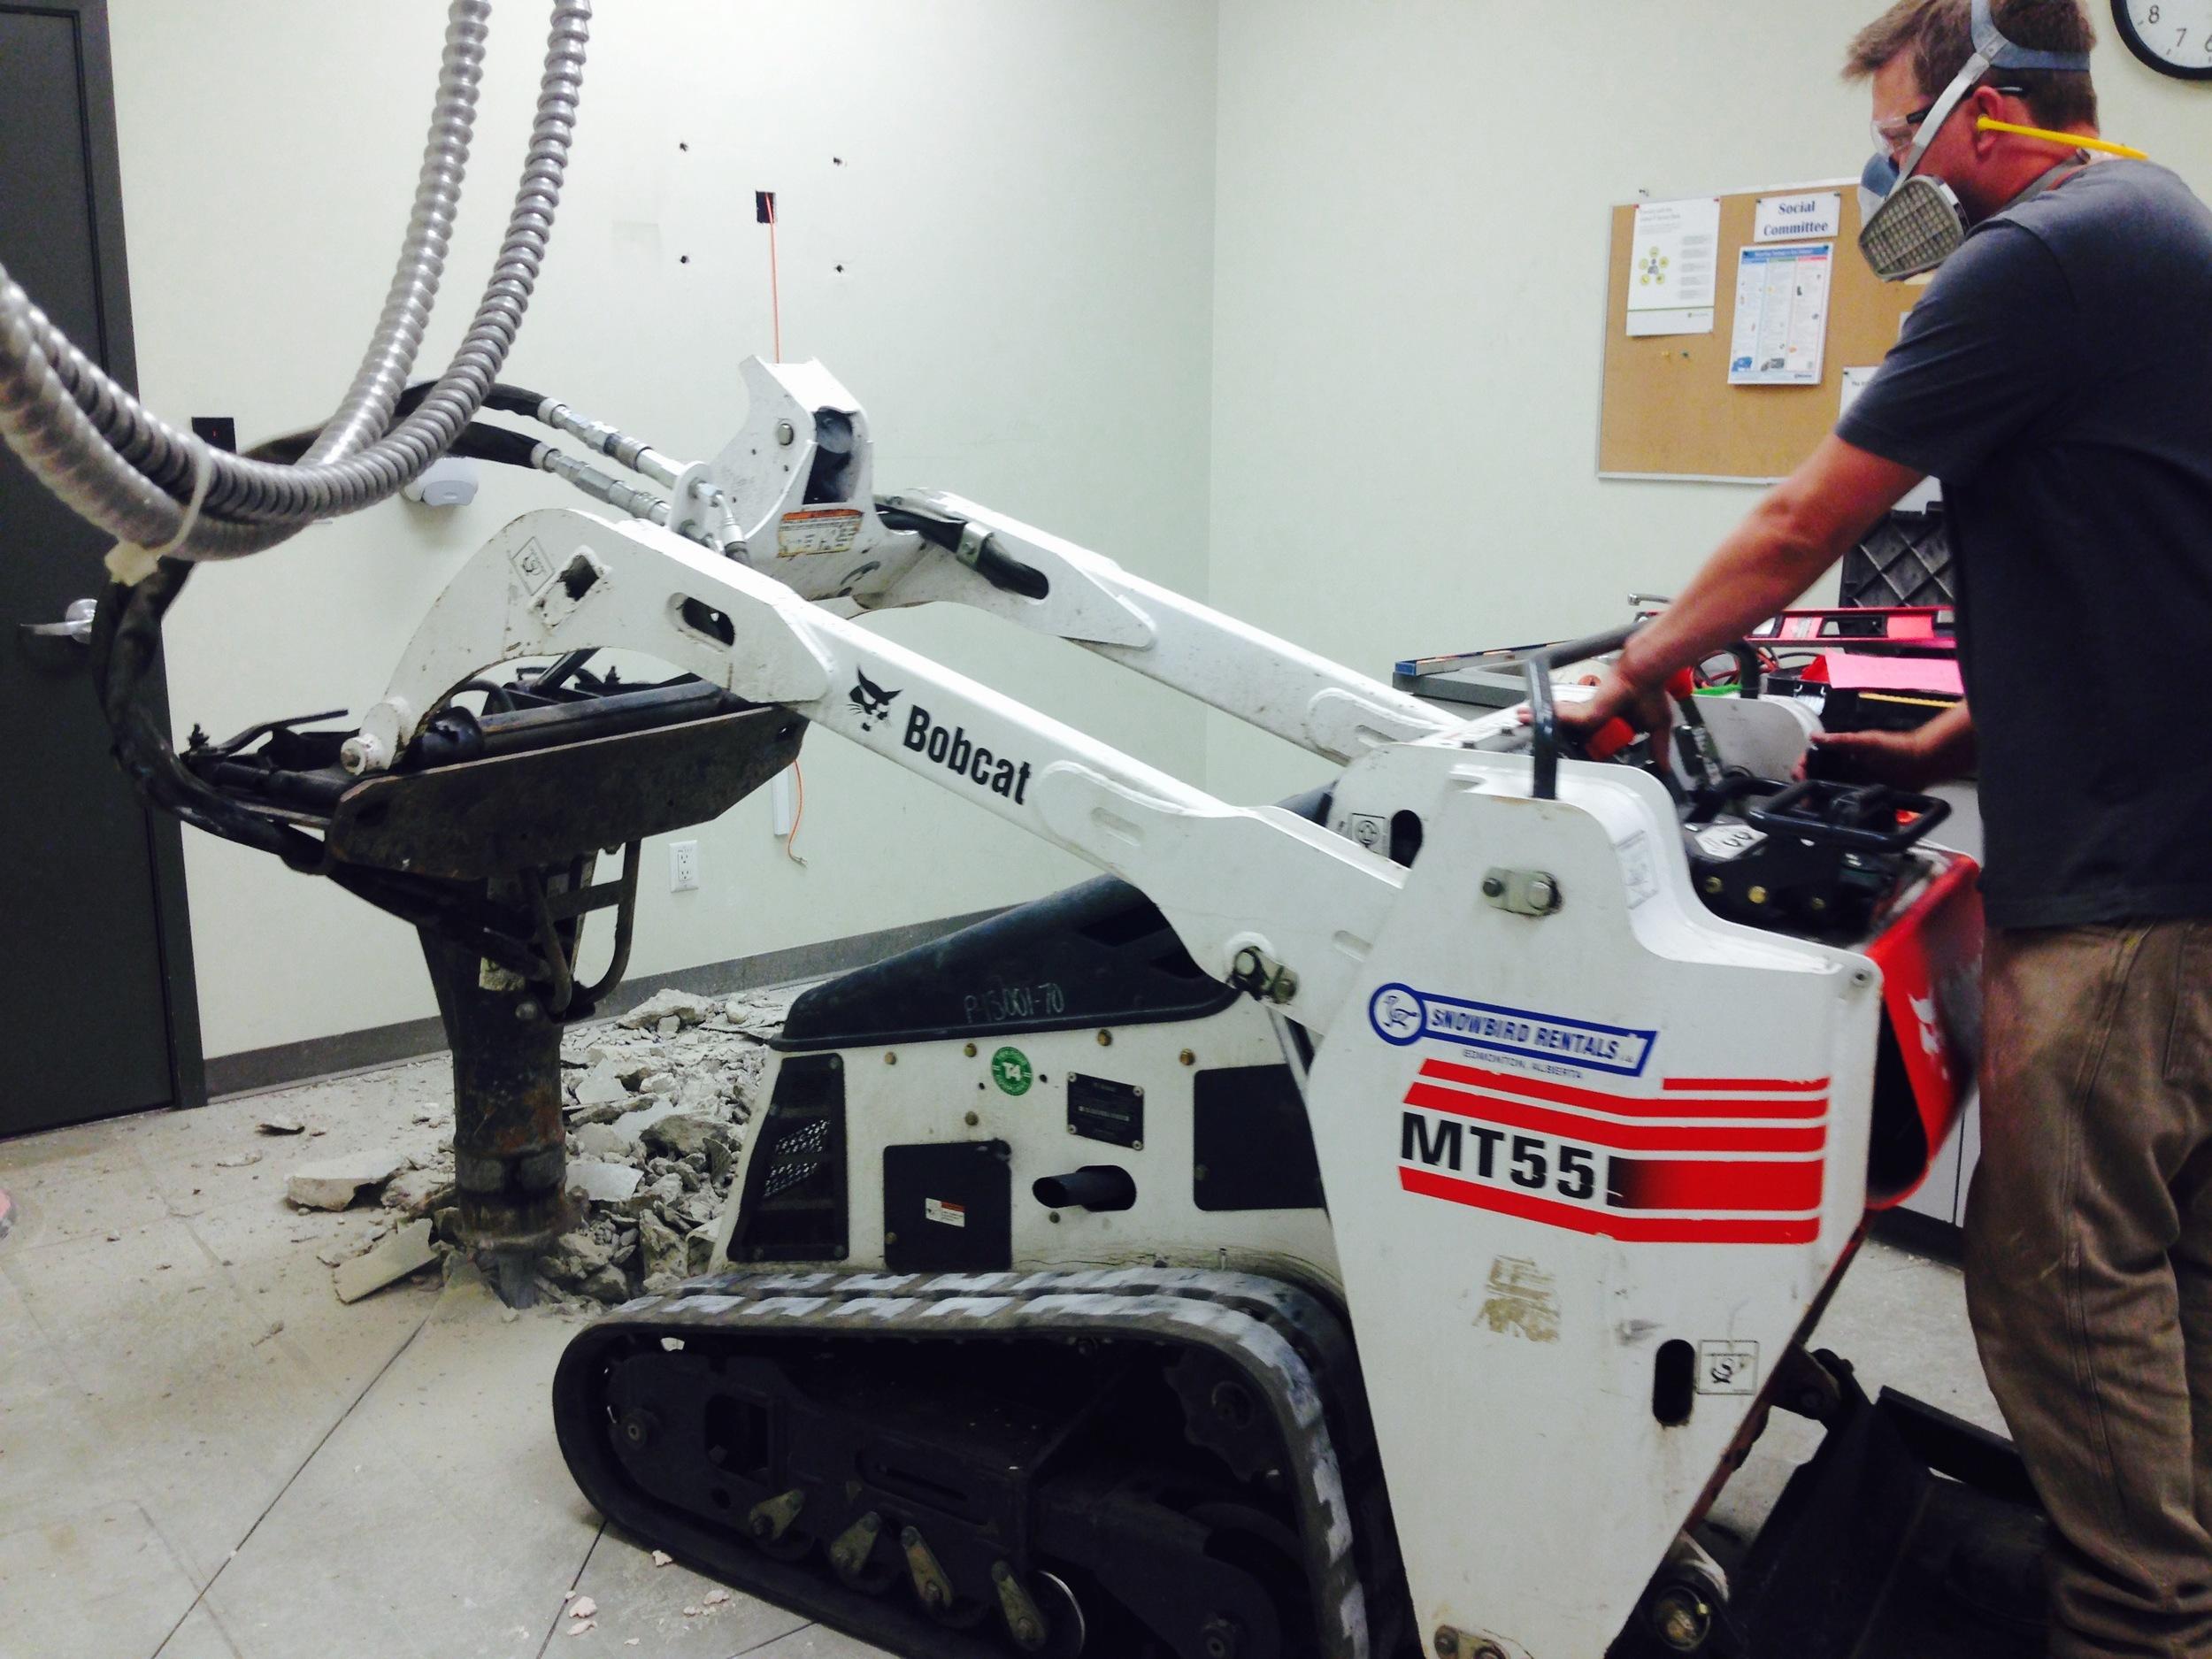 PB03  Plumbing - General Contractors Commercial Renovations in Edmonton, Office and Warehouse Project Contractors